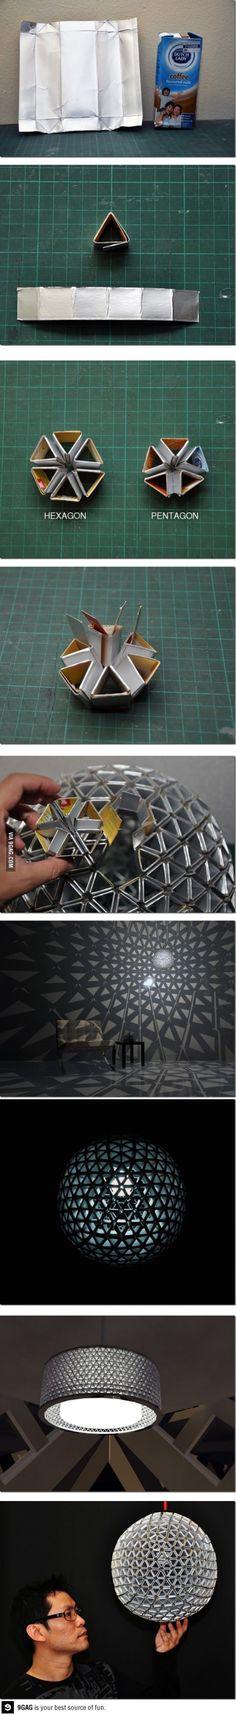 Tetra Pak Origami Lamps